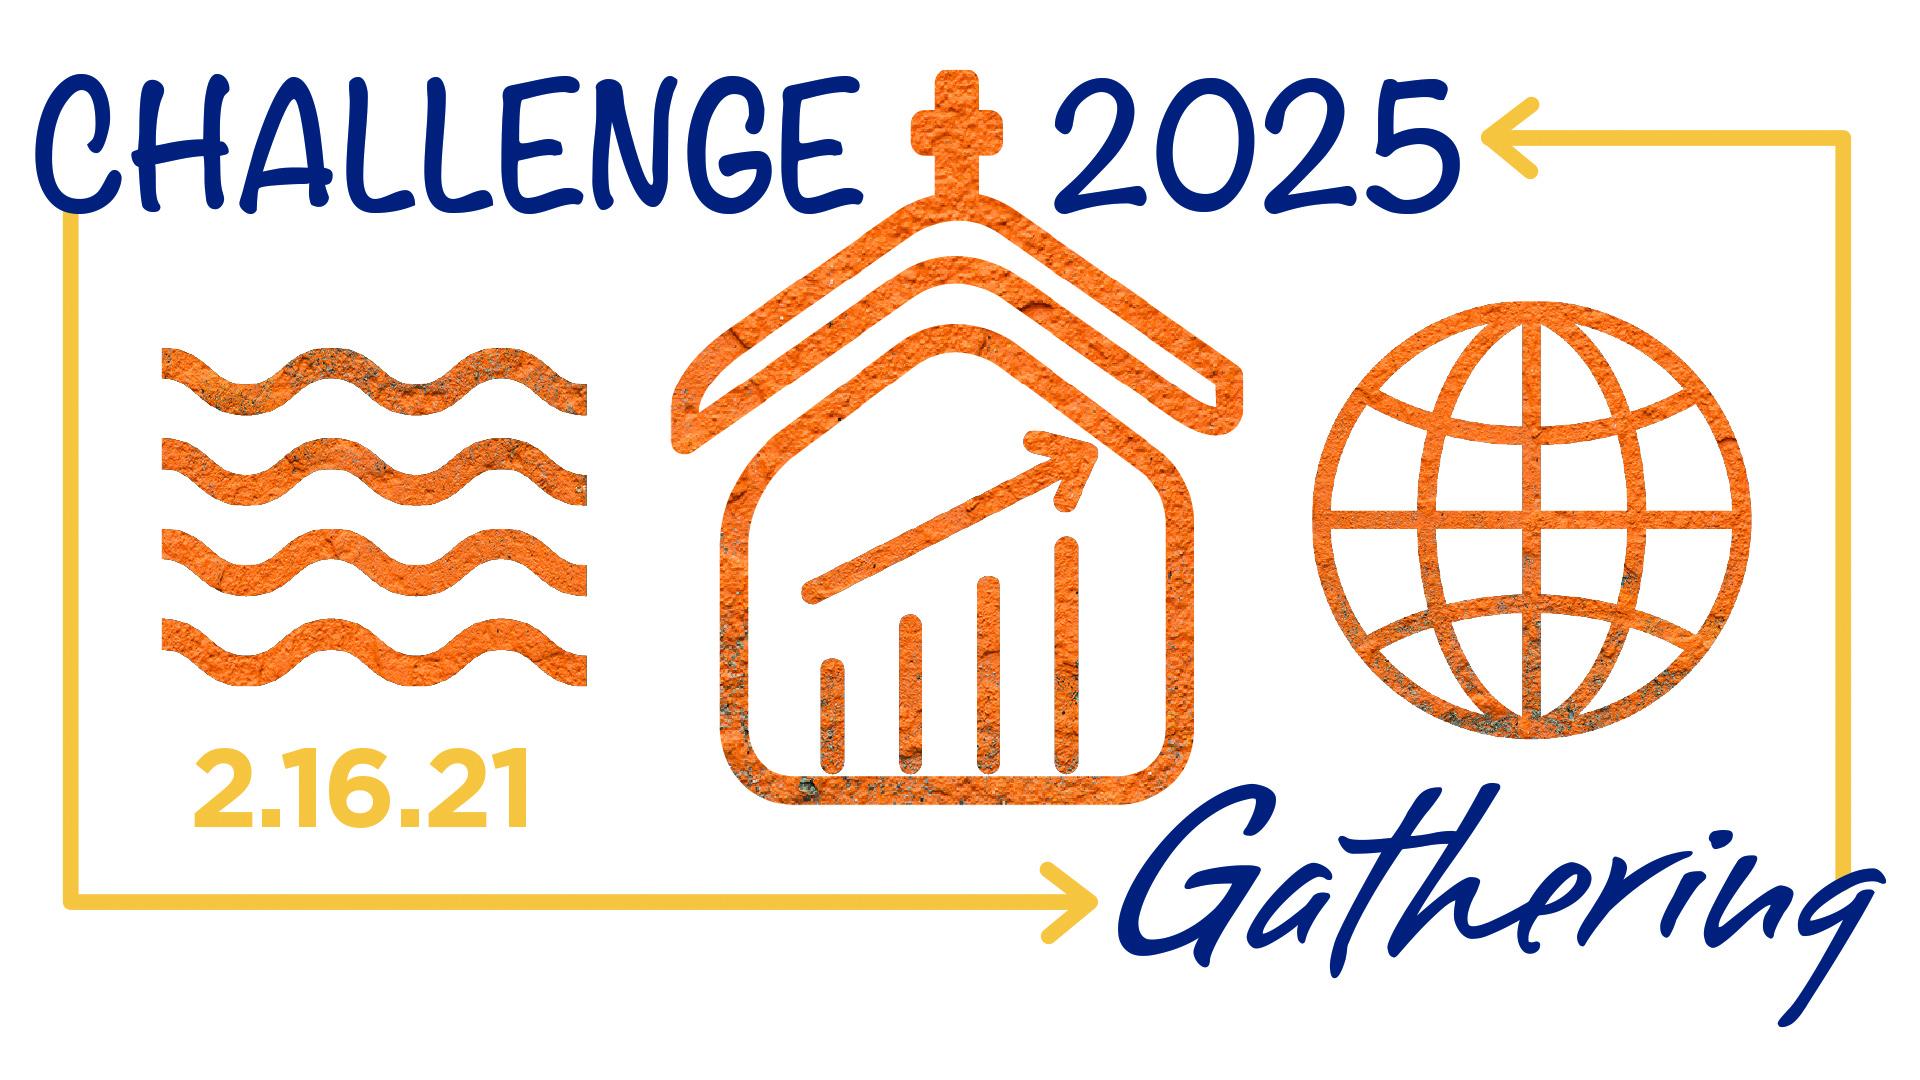 Challenge 2025